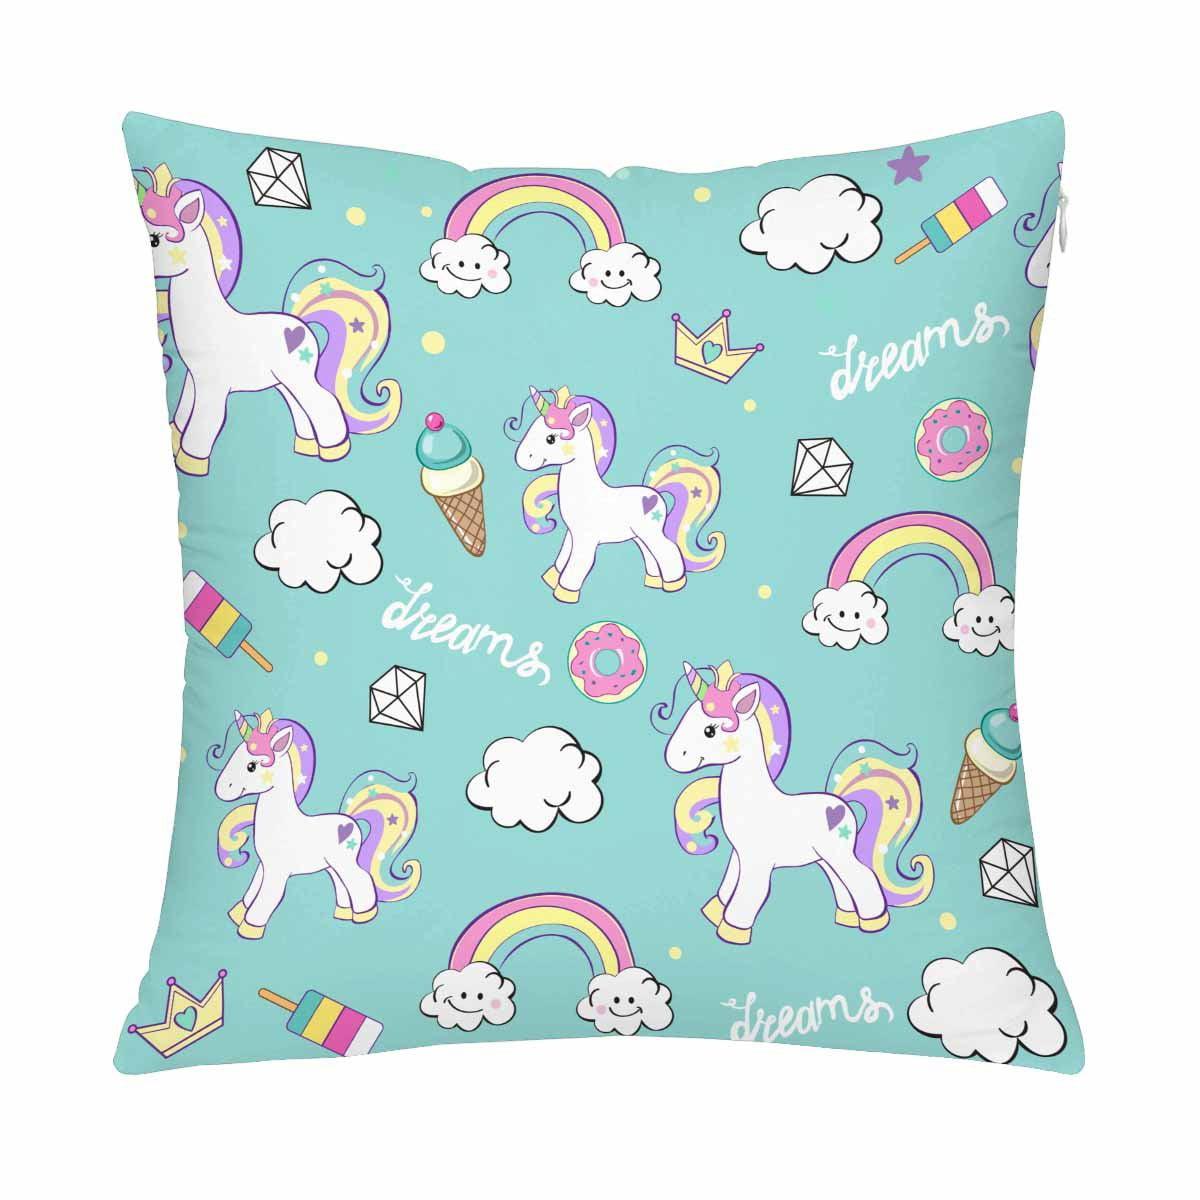 MKHERT Beautiful Unicorns With Diamond Ice Cream And Clouds Pillow Covers Pillowcase Throw Pillows 18x18 inch